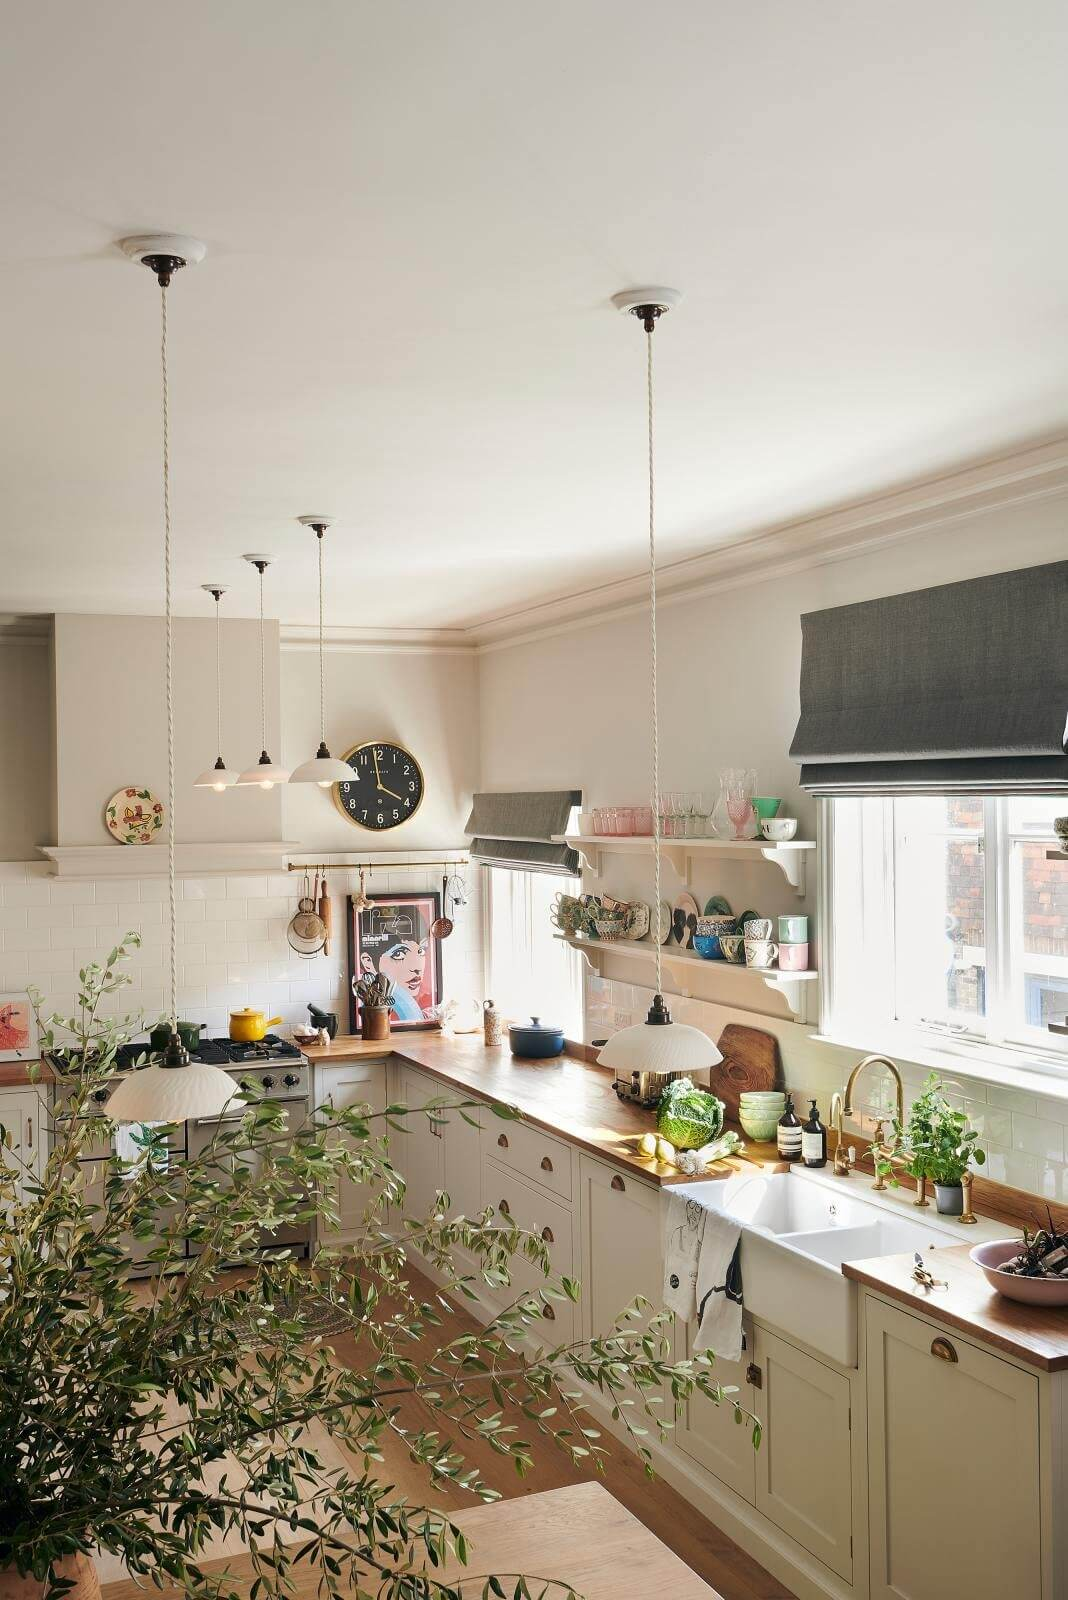 A Wonderful Dining Nook in Zoe Ball's deVOL Kitchen